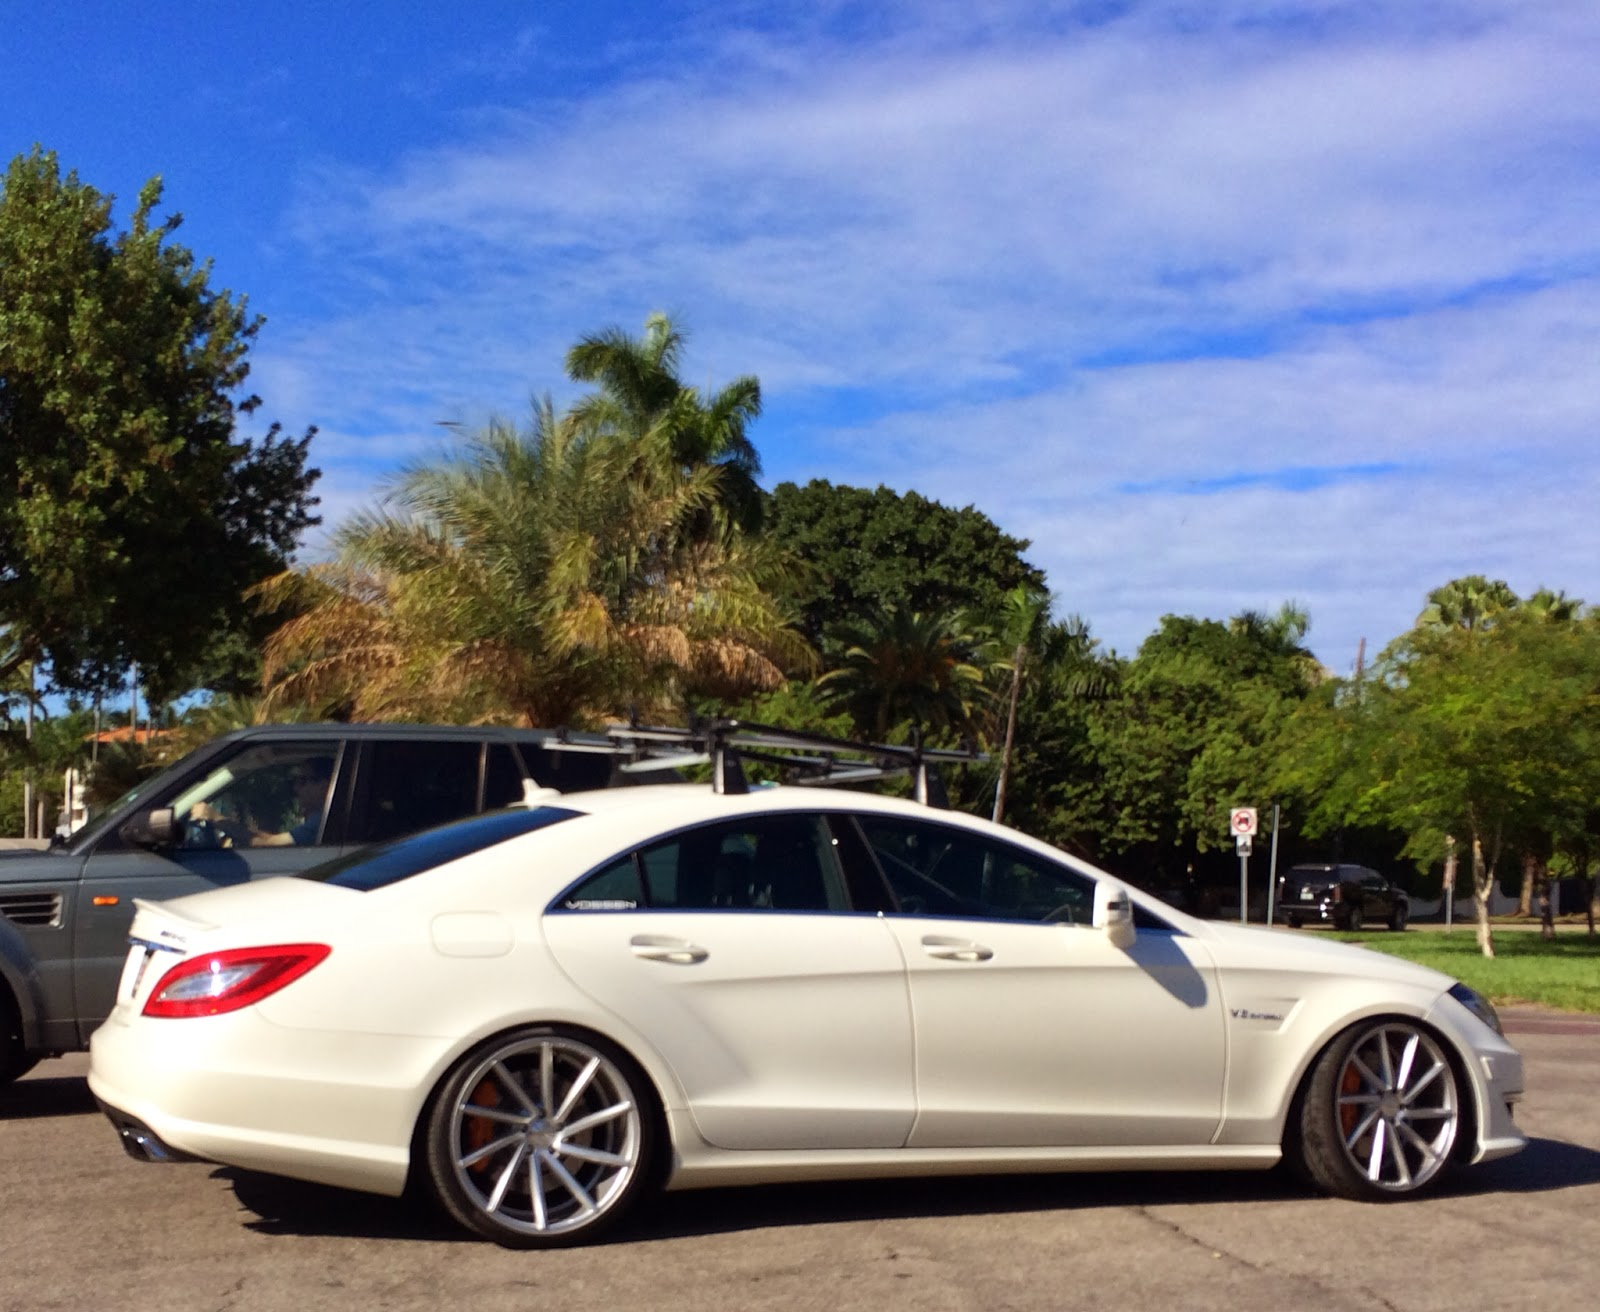 Mercedes CLS with Vossen Rims